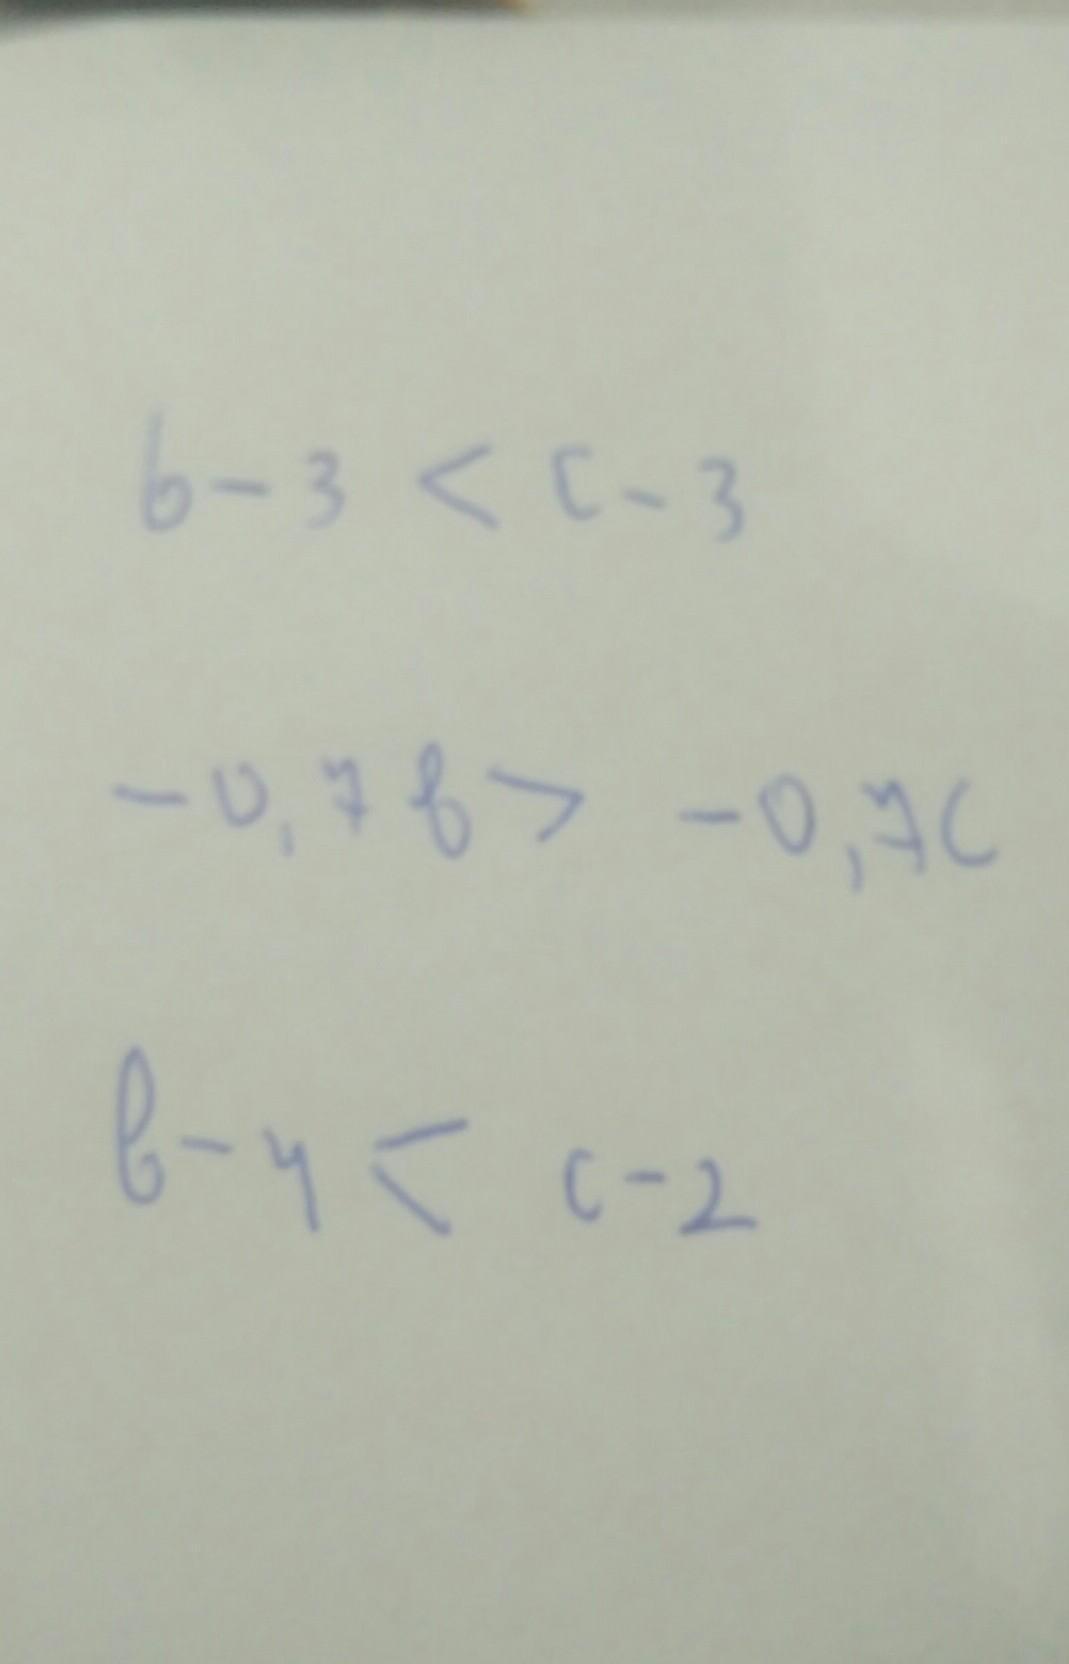 Известно, что b<c. Сравните.... 